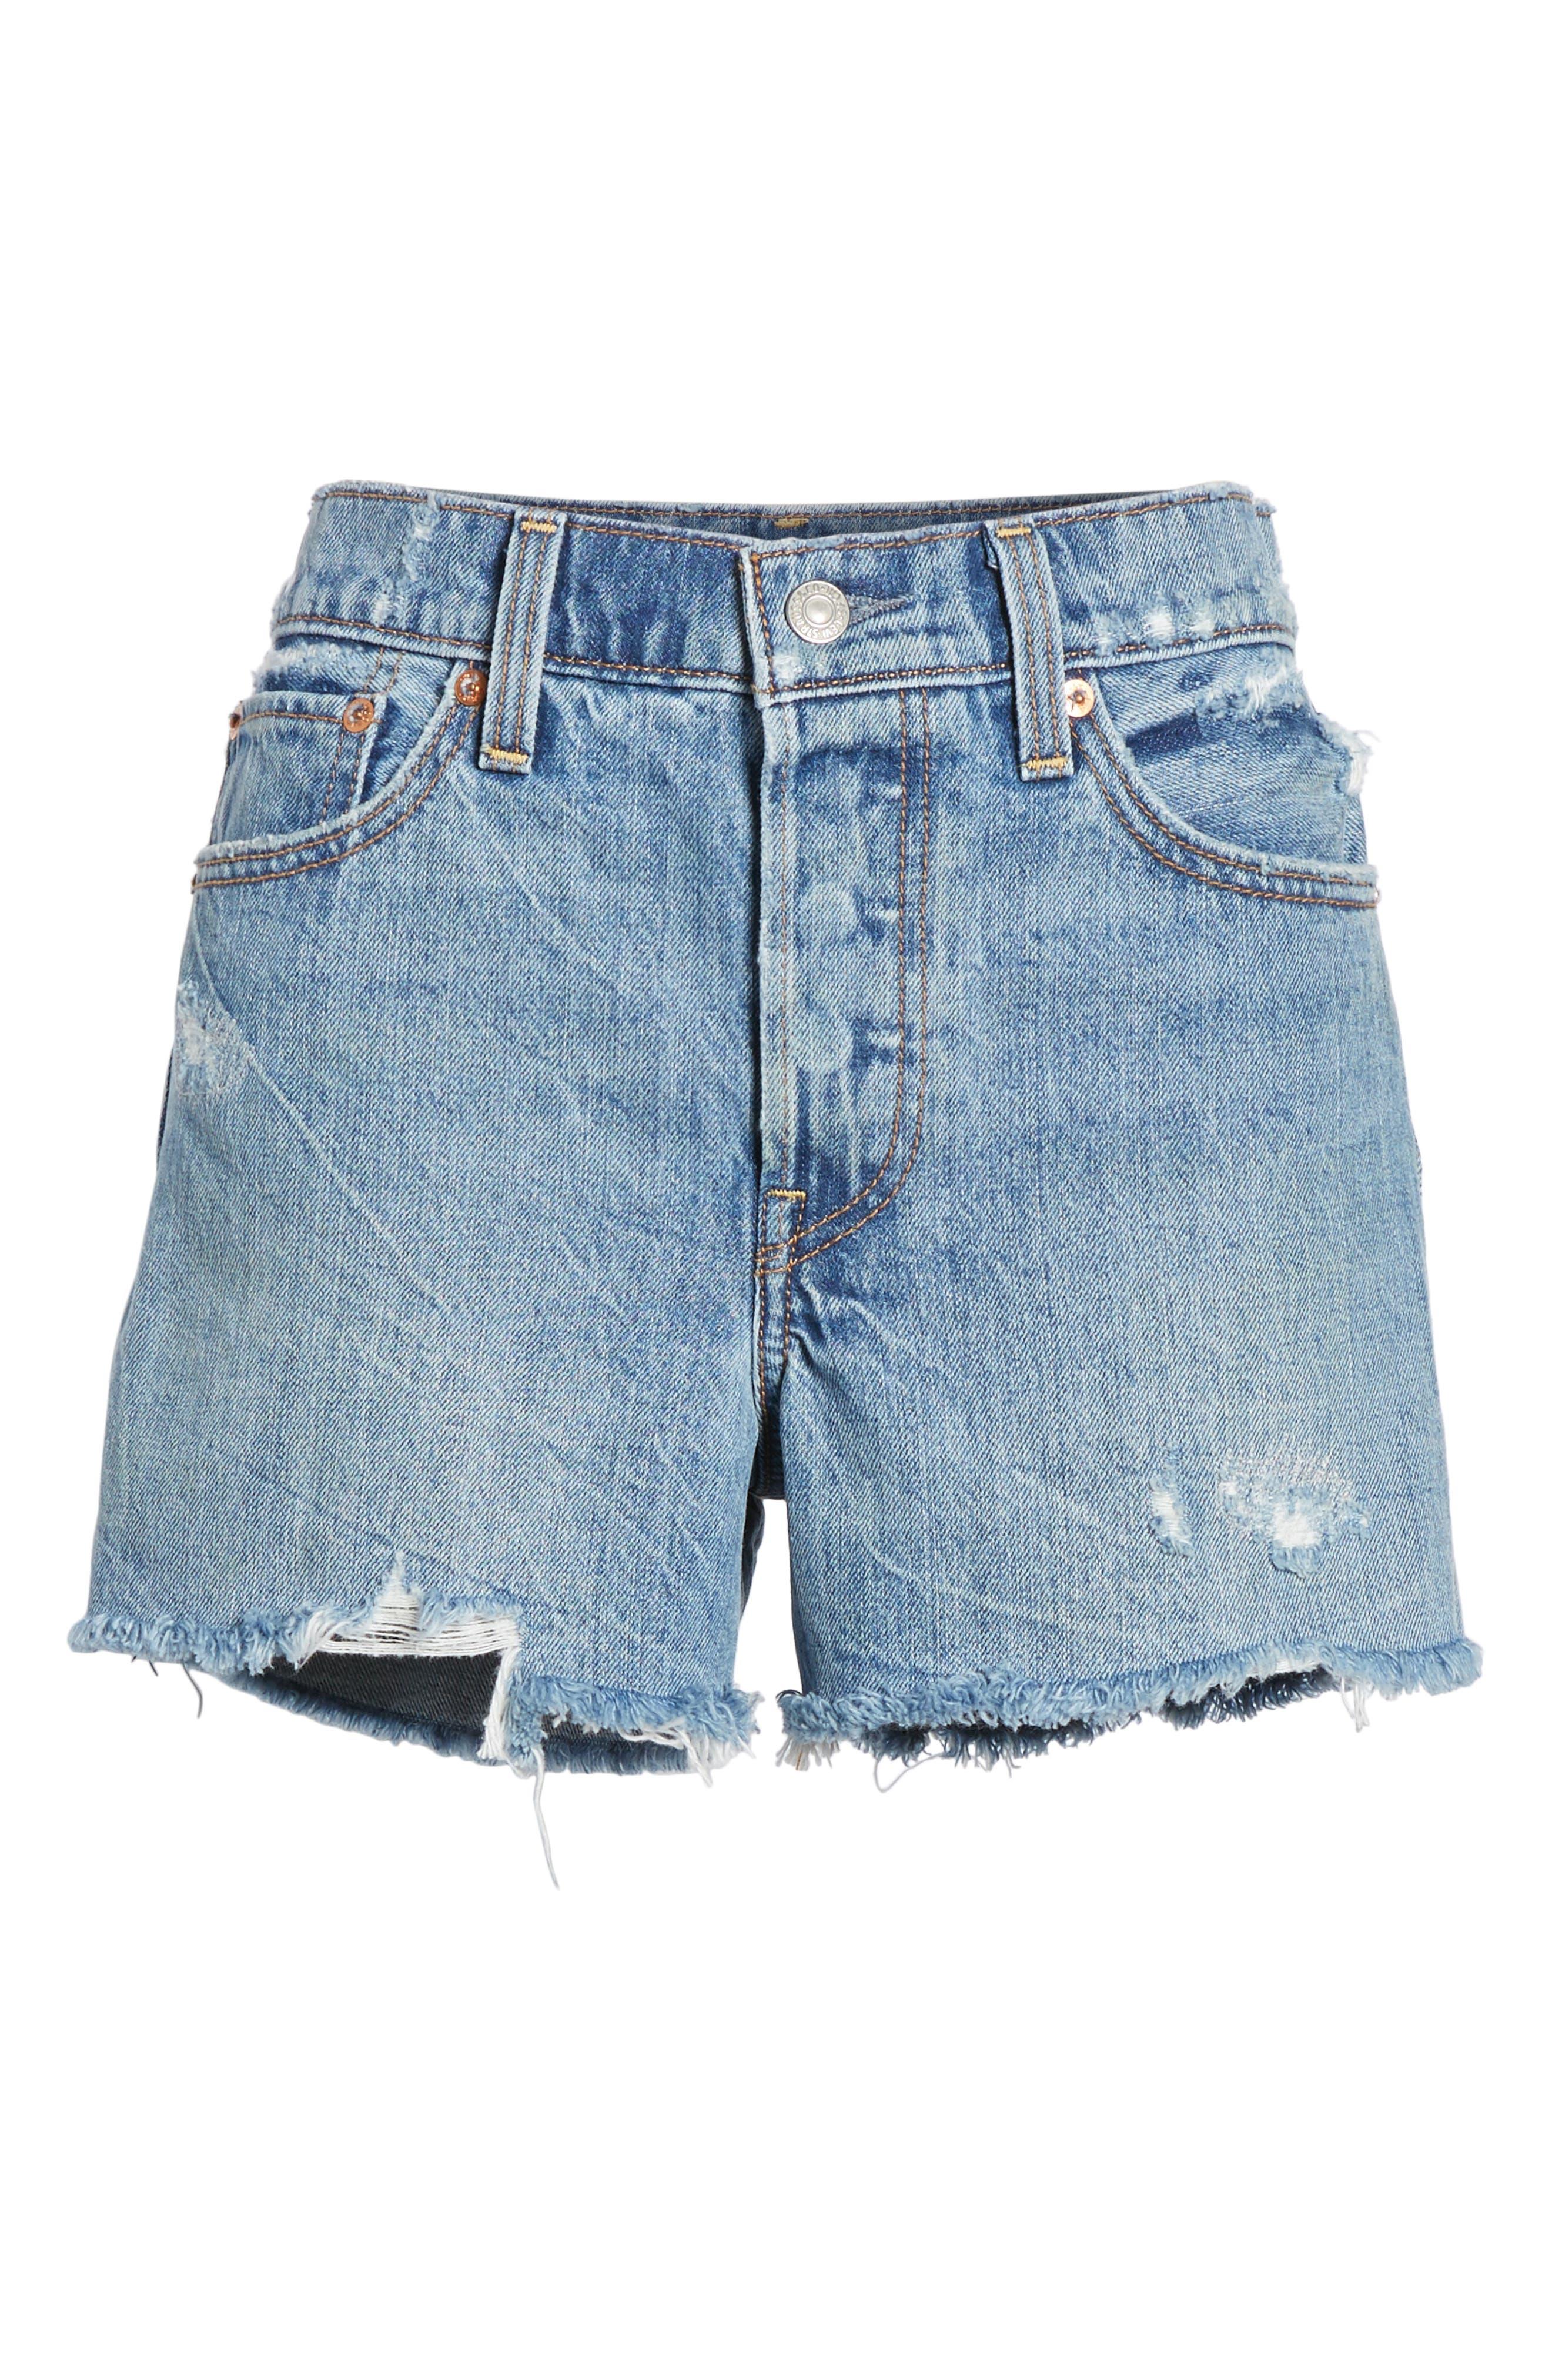 Wedgie High Waist Cutoff Denim Shorts,                             Alternate thumbnail 7, color,                             401